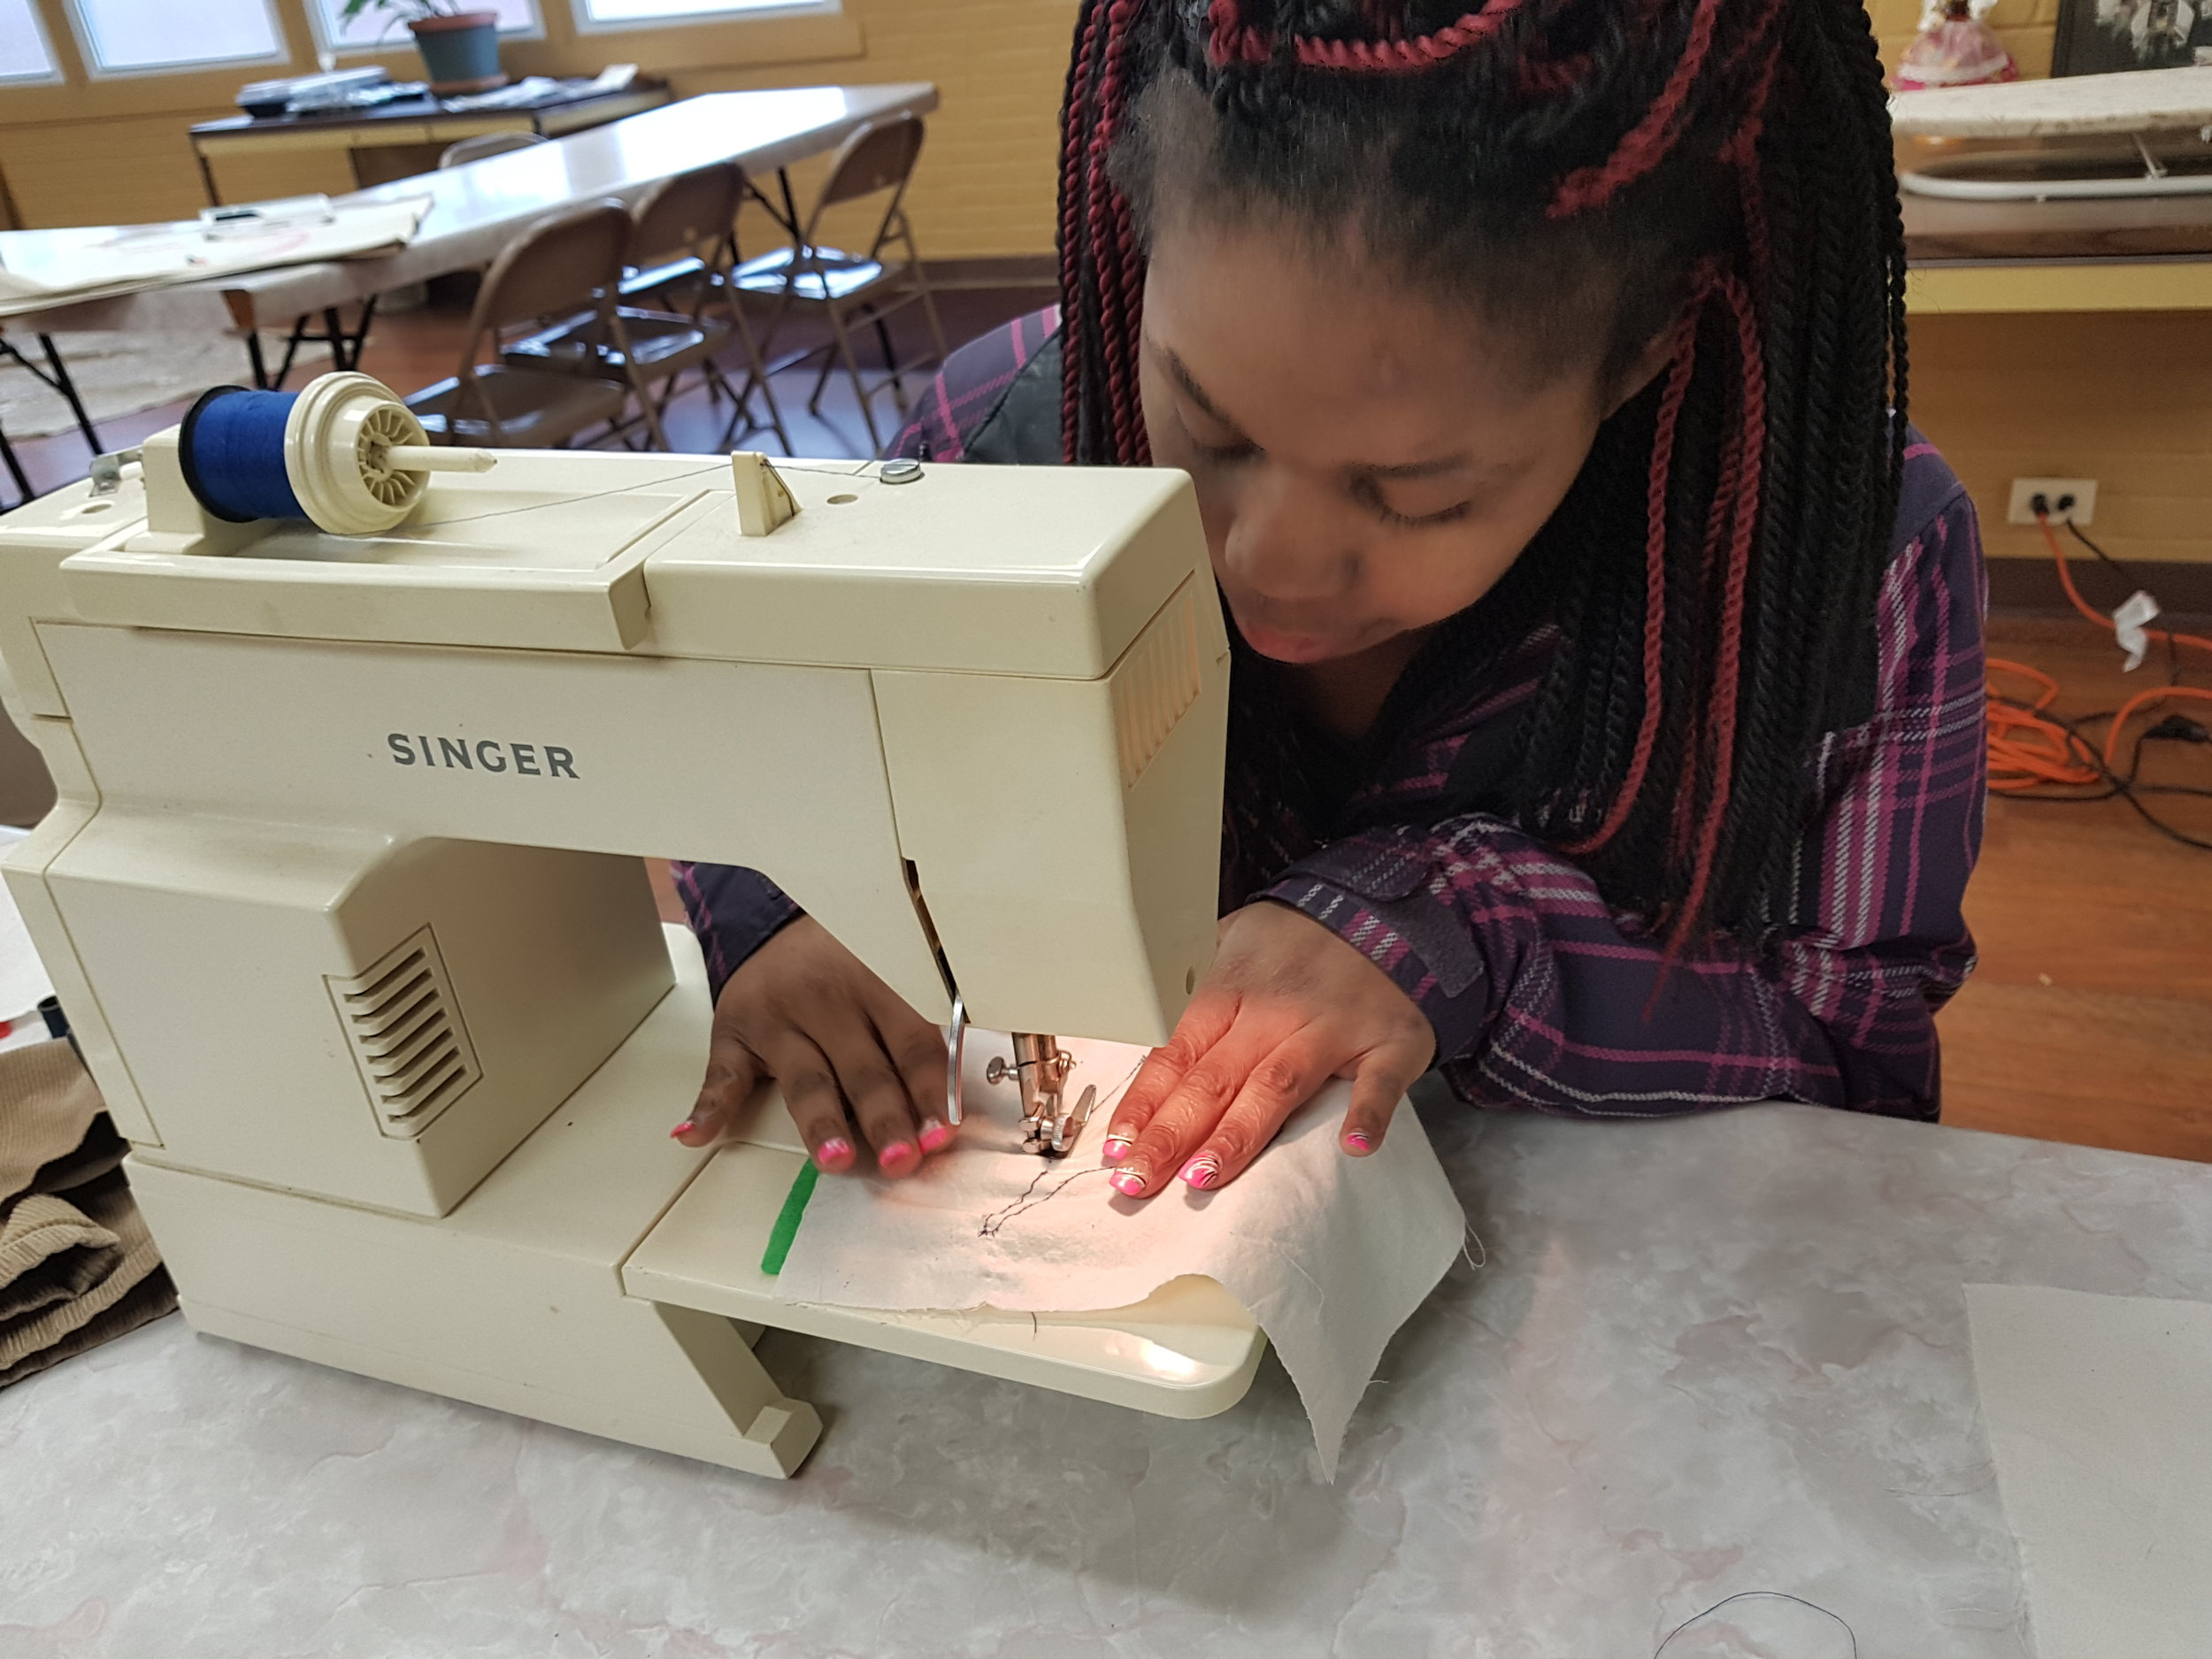 SewingMachine4.jpg